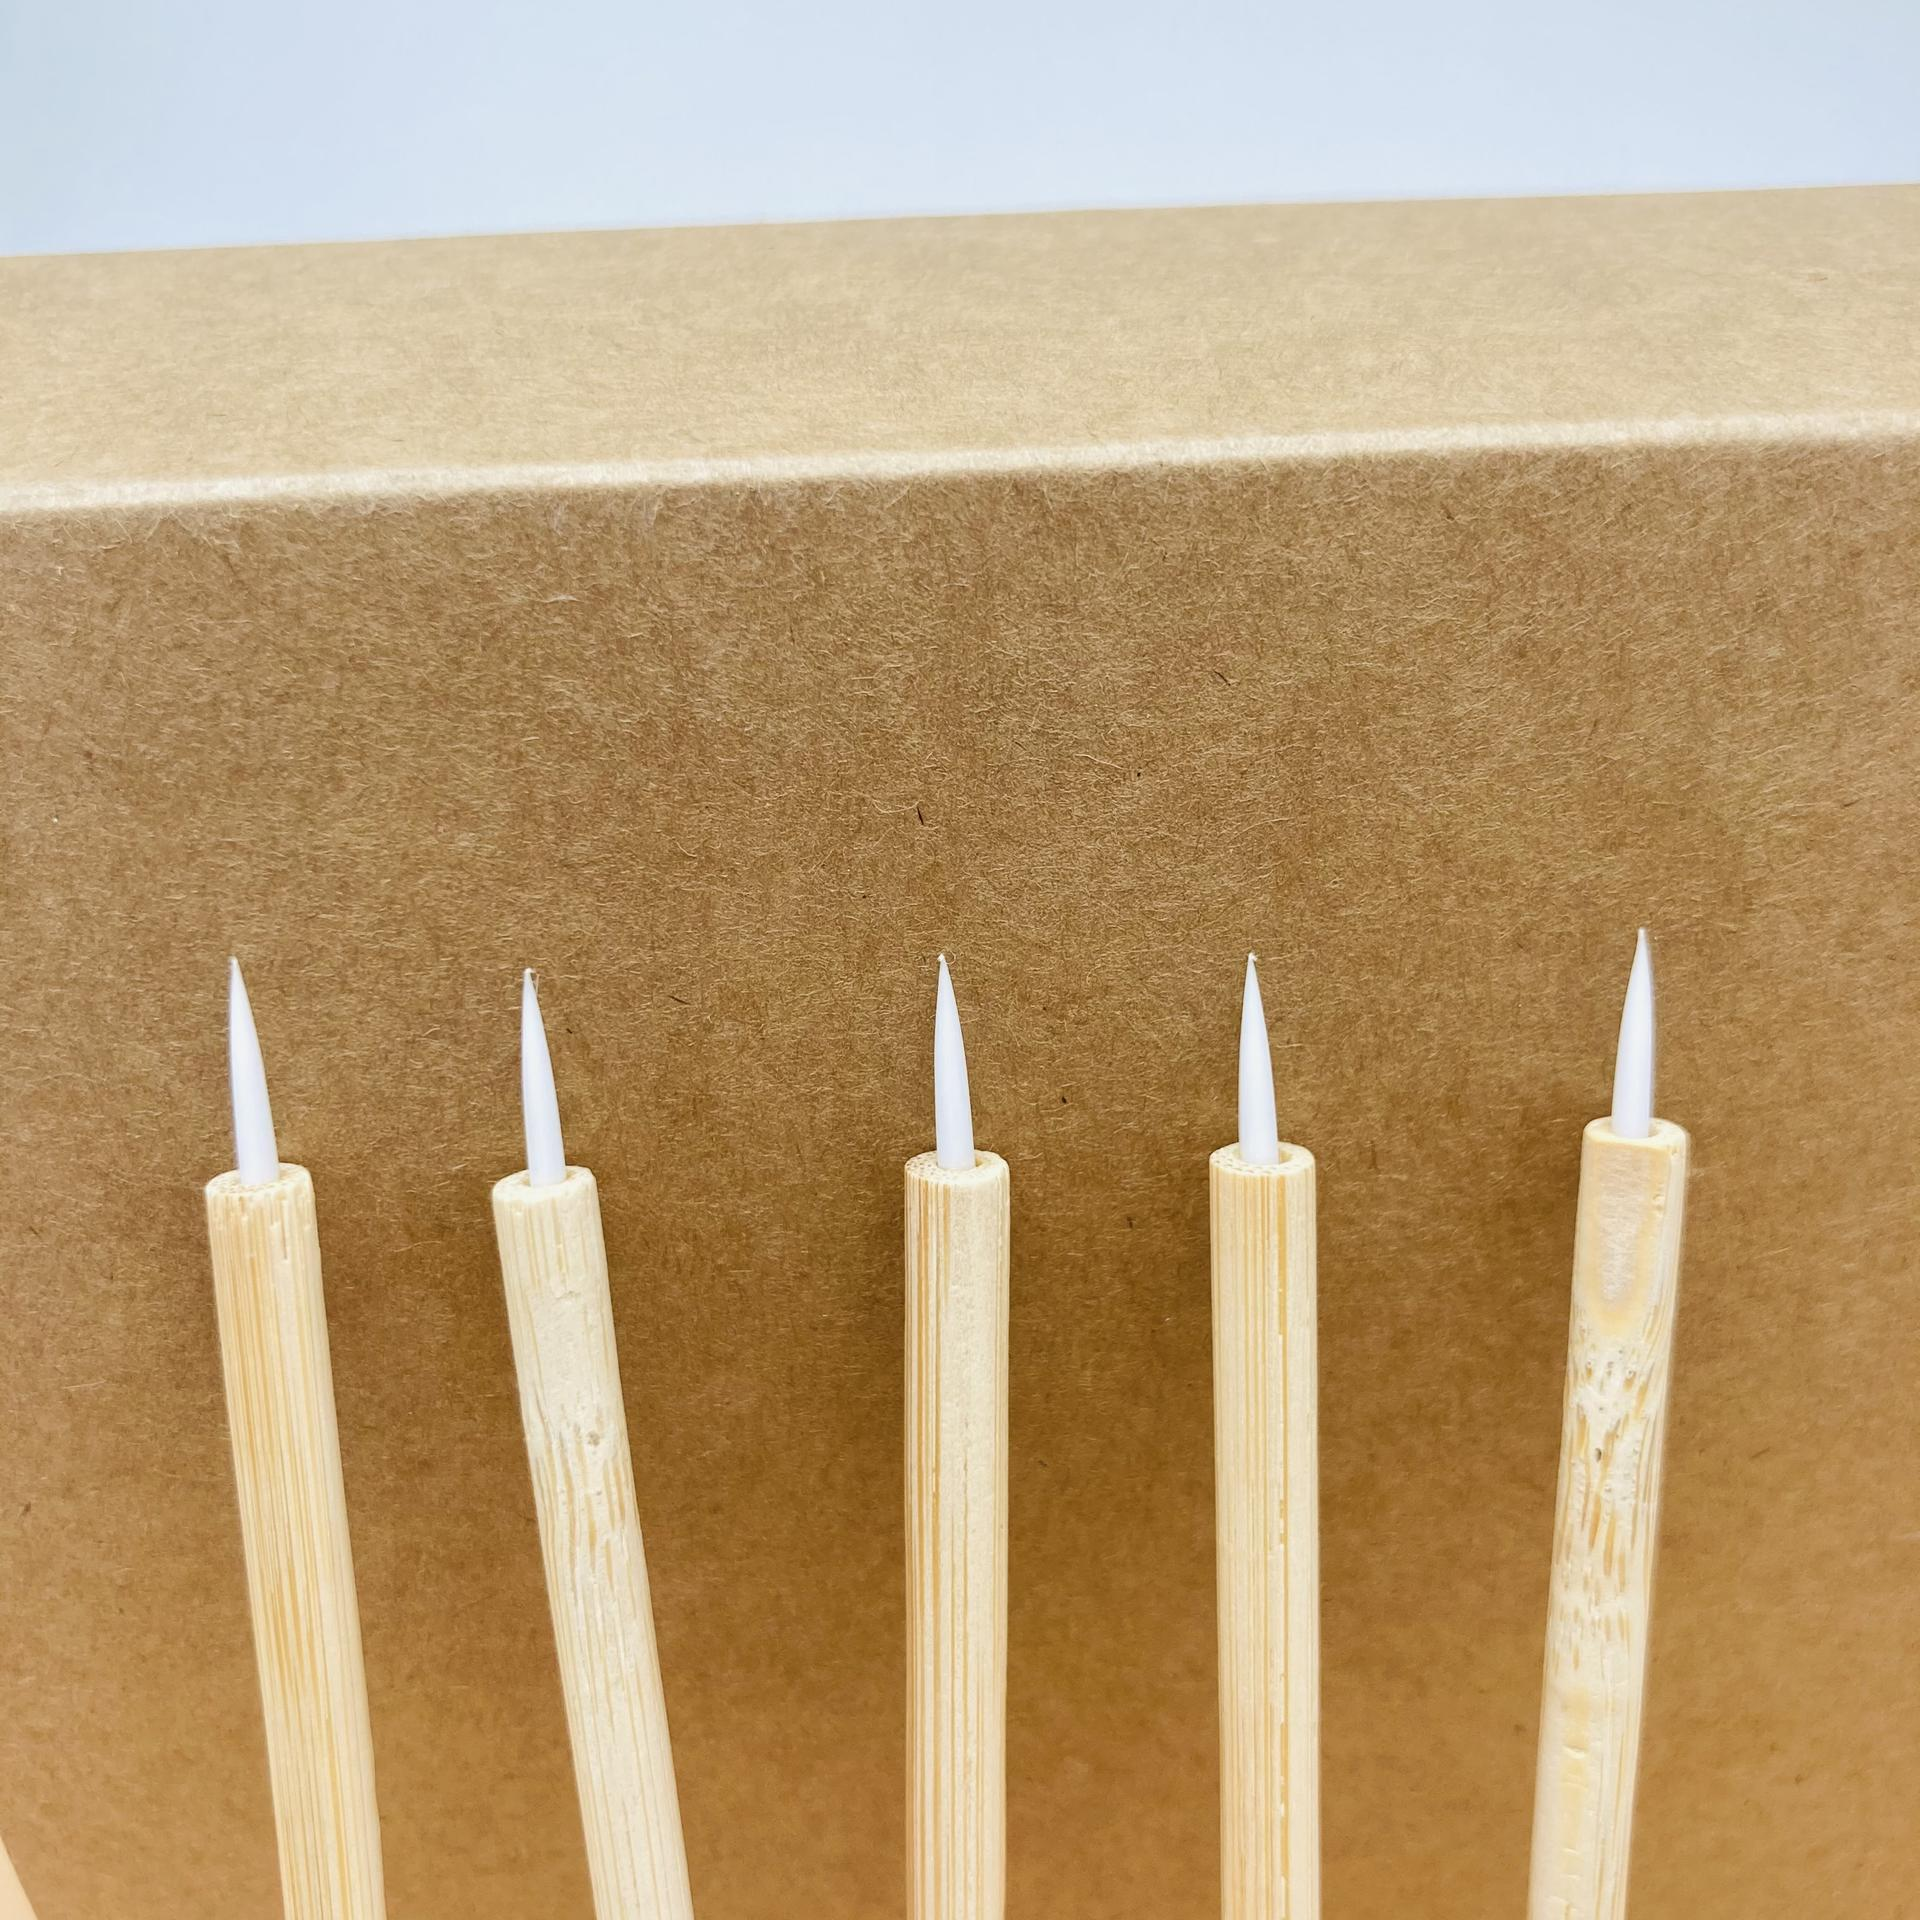 Eco-friendly Applicators with Bamboo Handle Mascara Wand Lint-free Applicator Lip Brush Eyeliner Brush